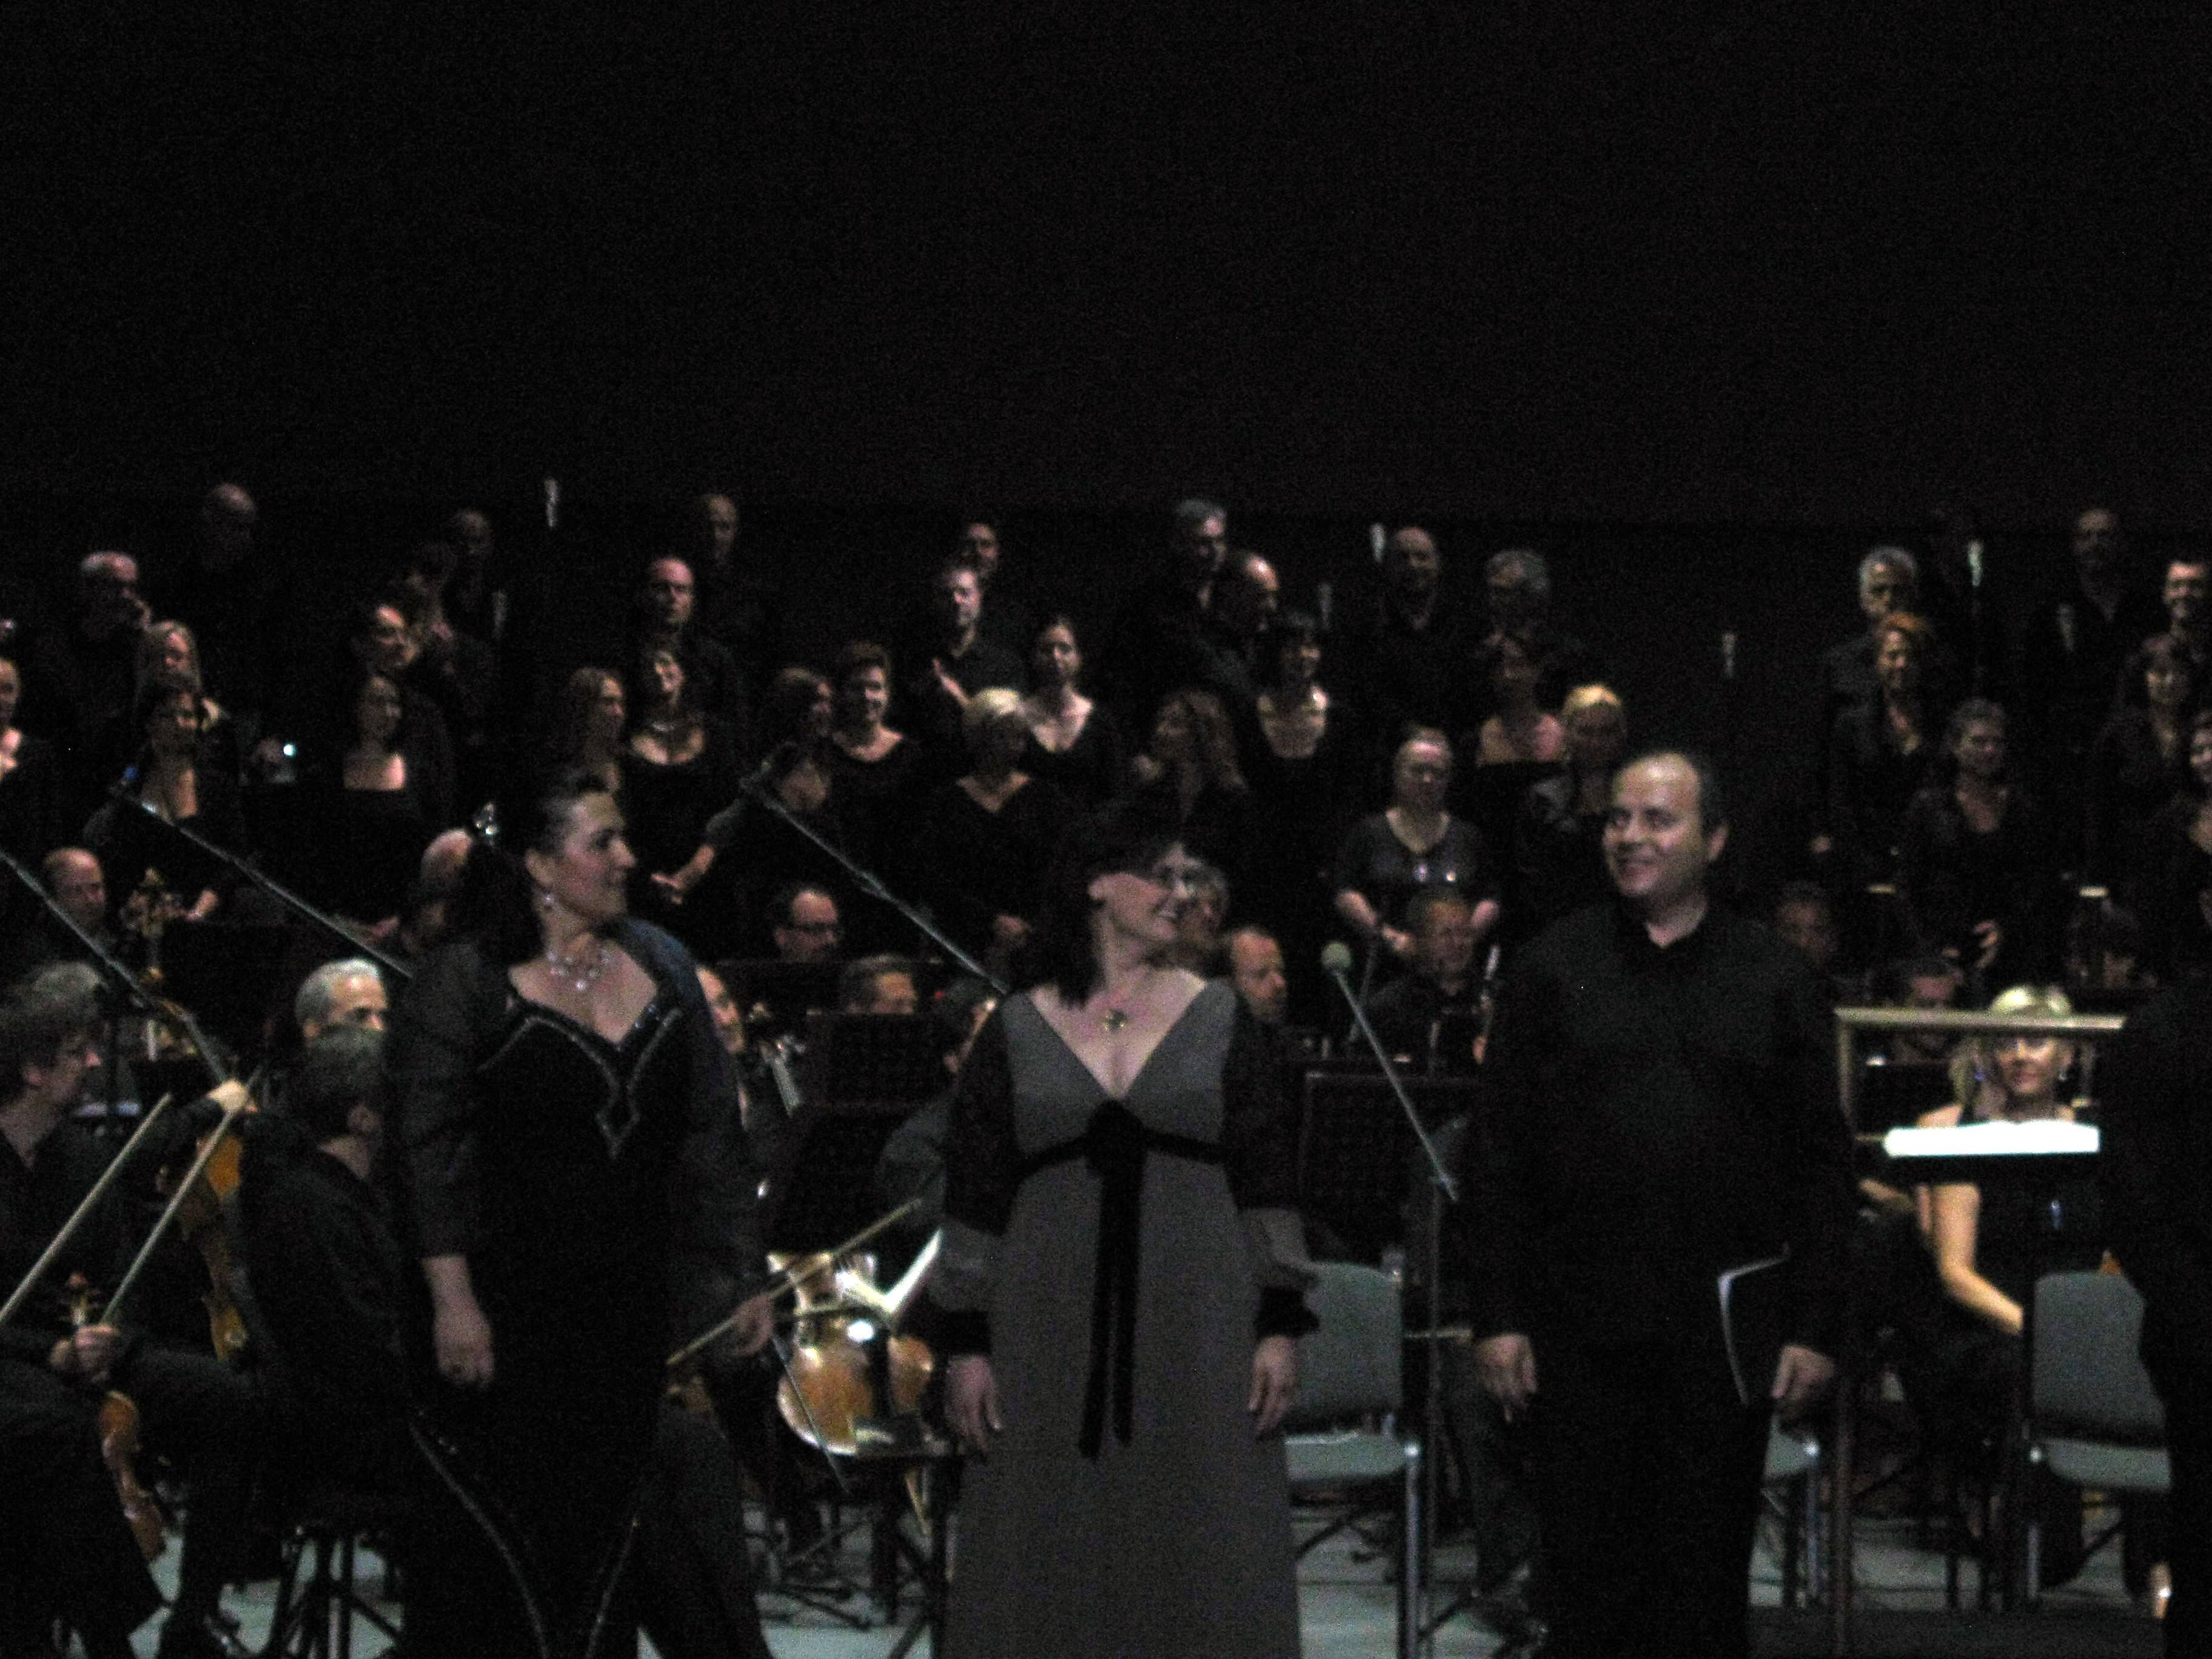 Auditorium 19 lug 2012 solisti Sinfonia n.9 di Beethoven (6